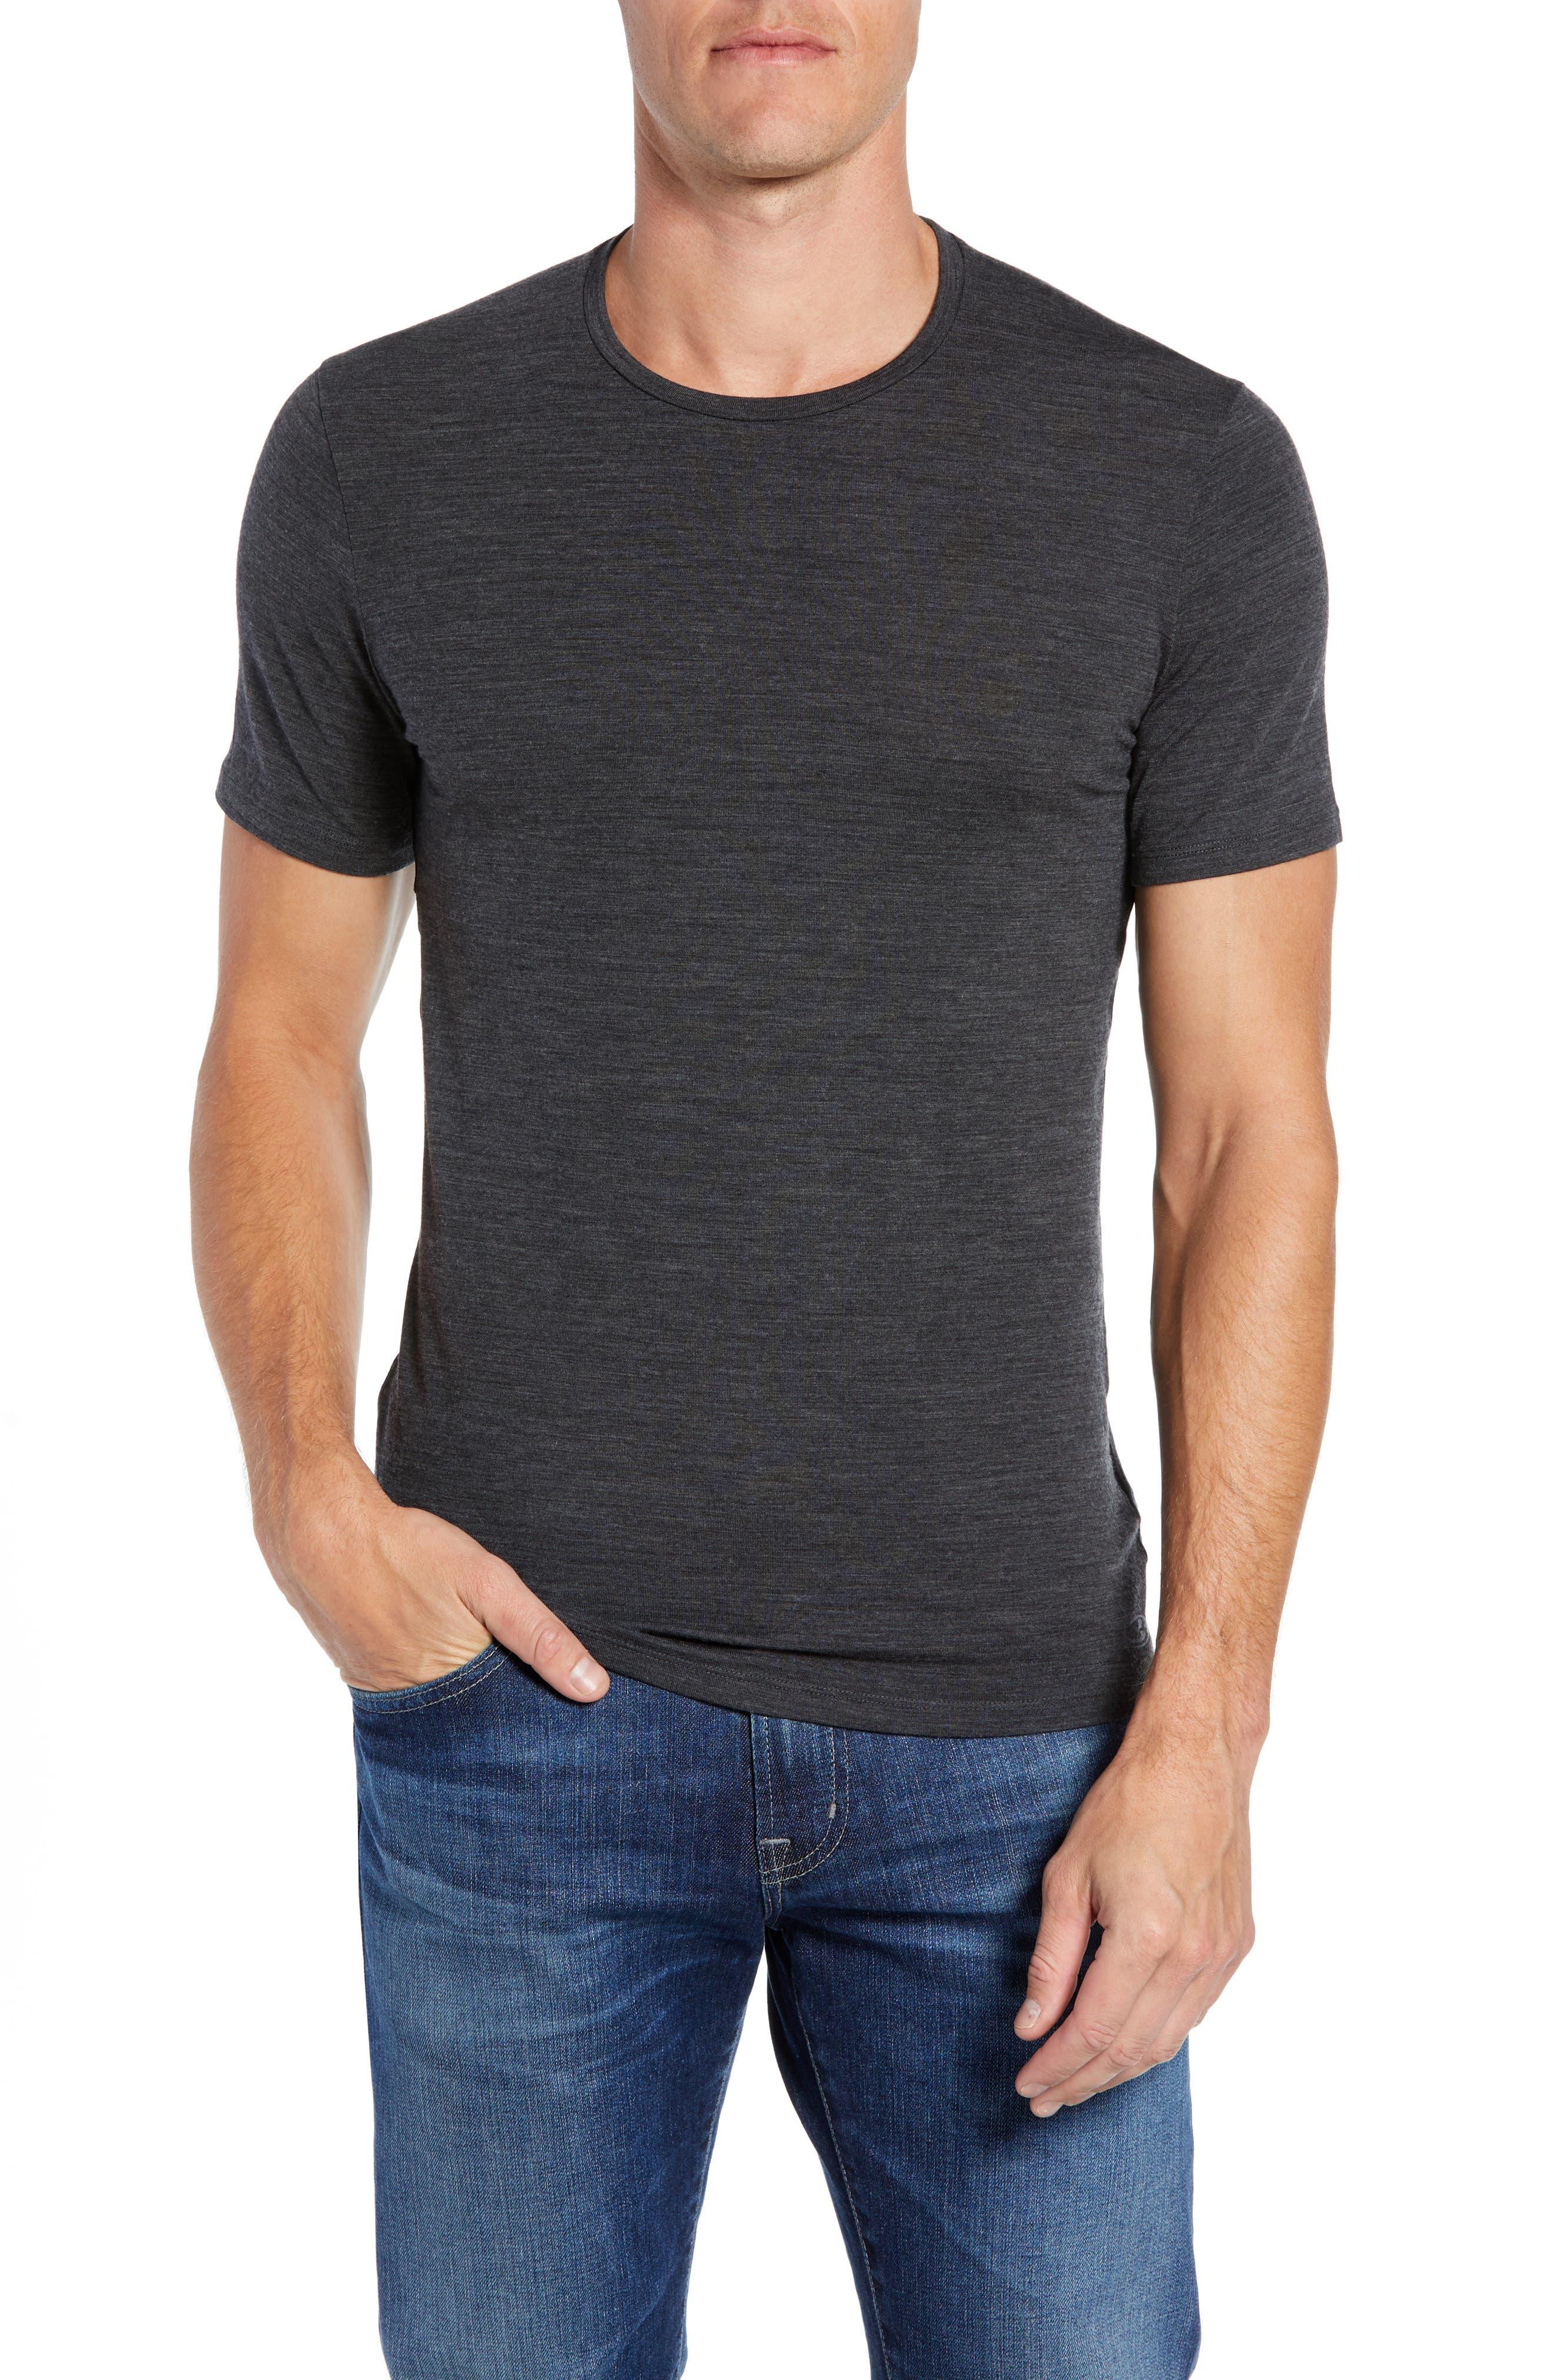 Anatomica Short Sleeve Crewneck T-Shirt,                             Main thumbnail 1, color,                             JET HEATHER/ BLACK